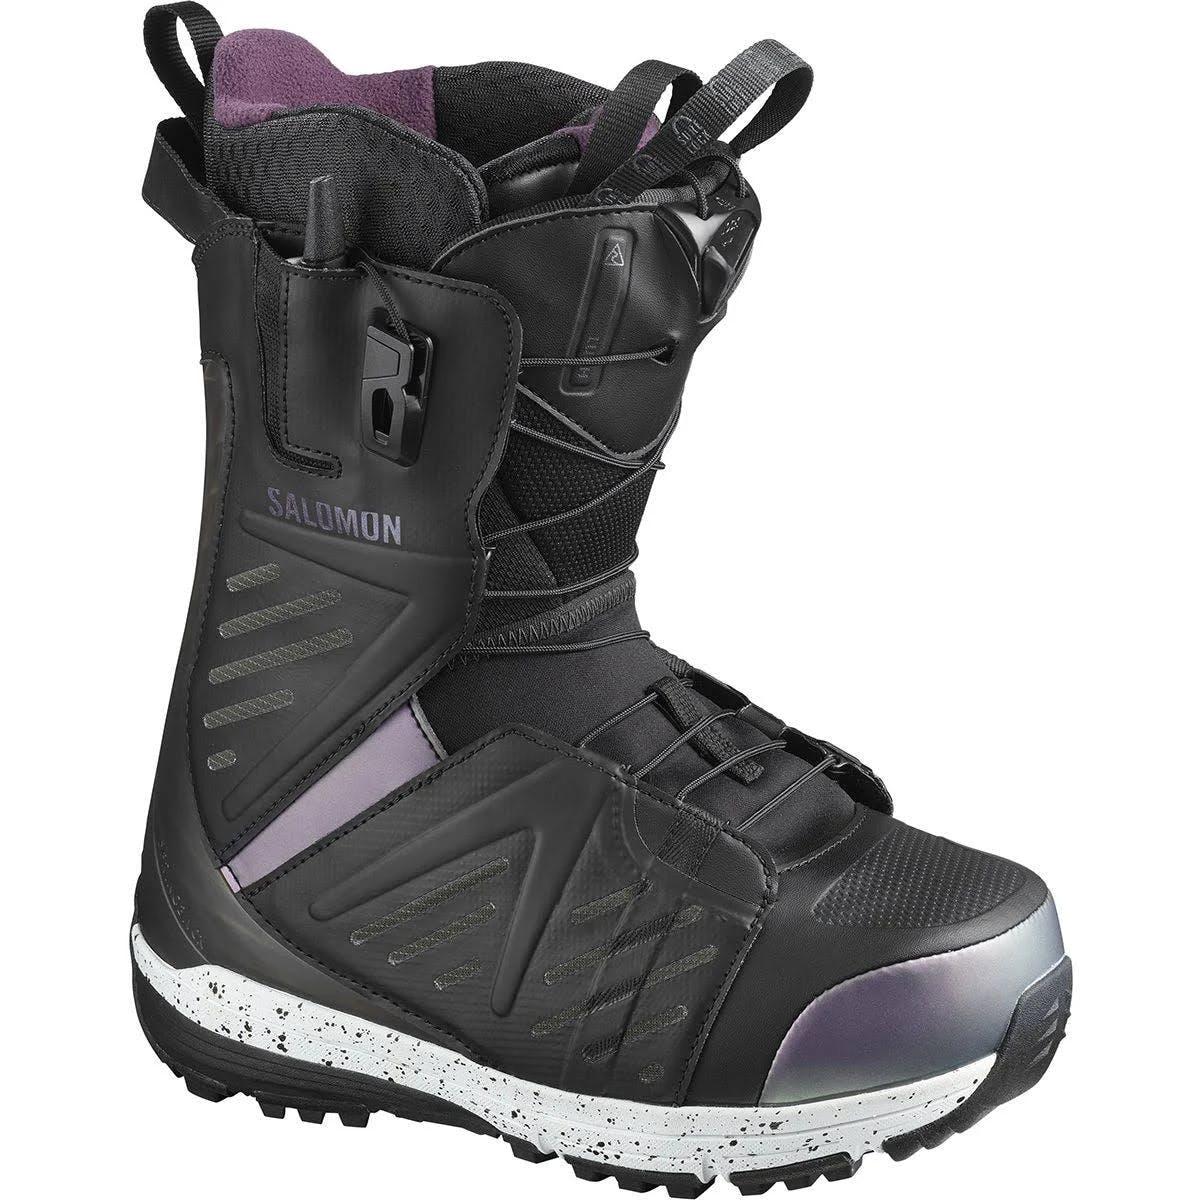 Salomon Lush Women's Snowboard Boots · 2020